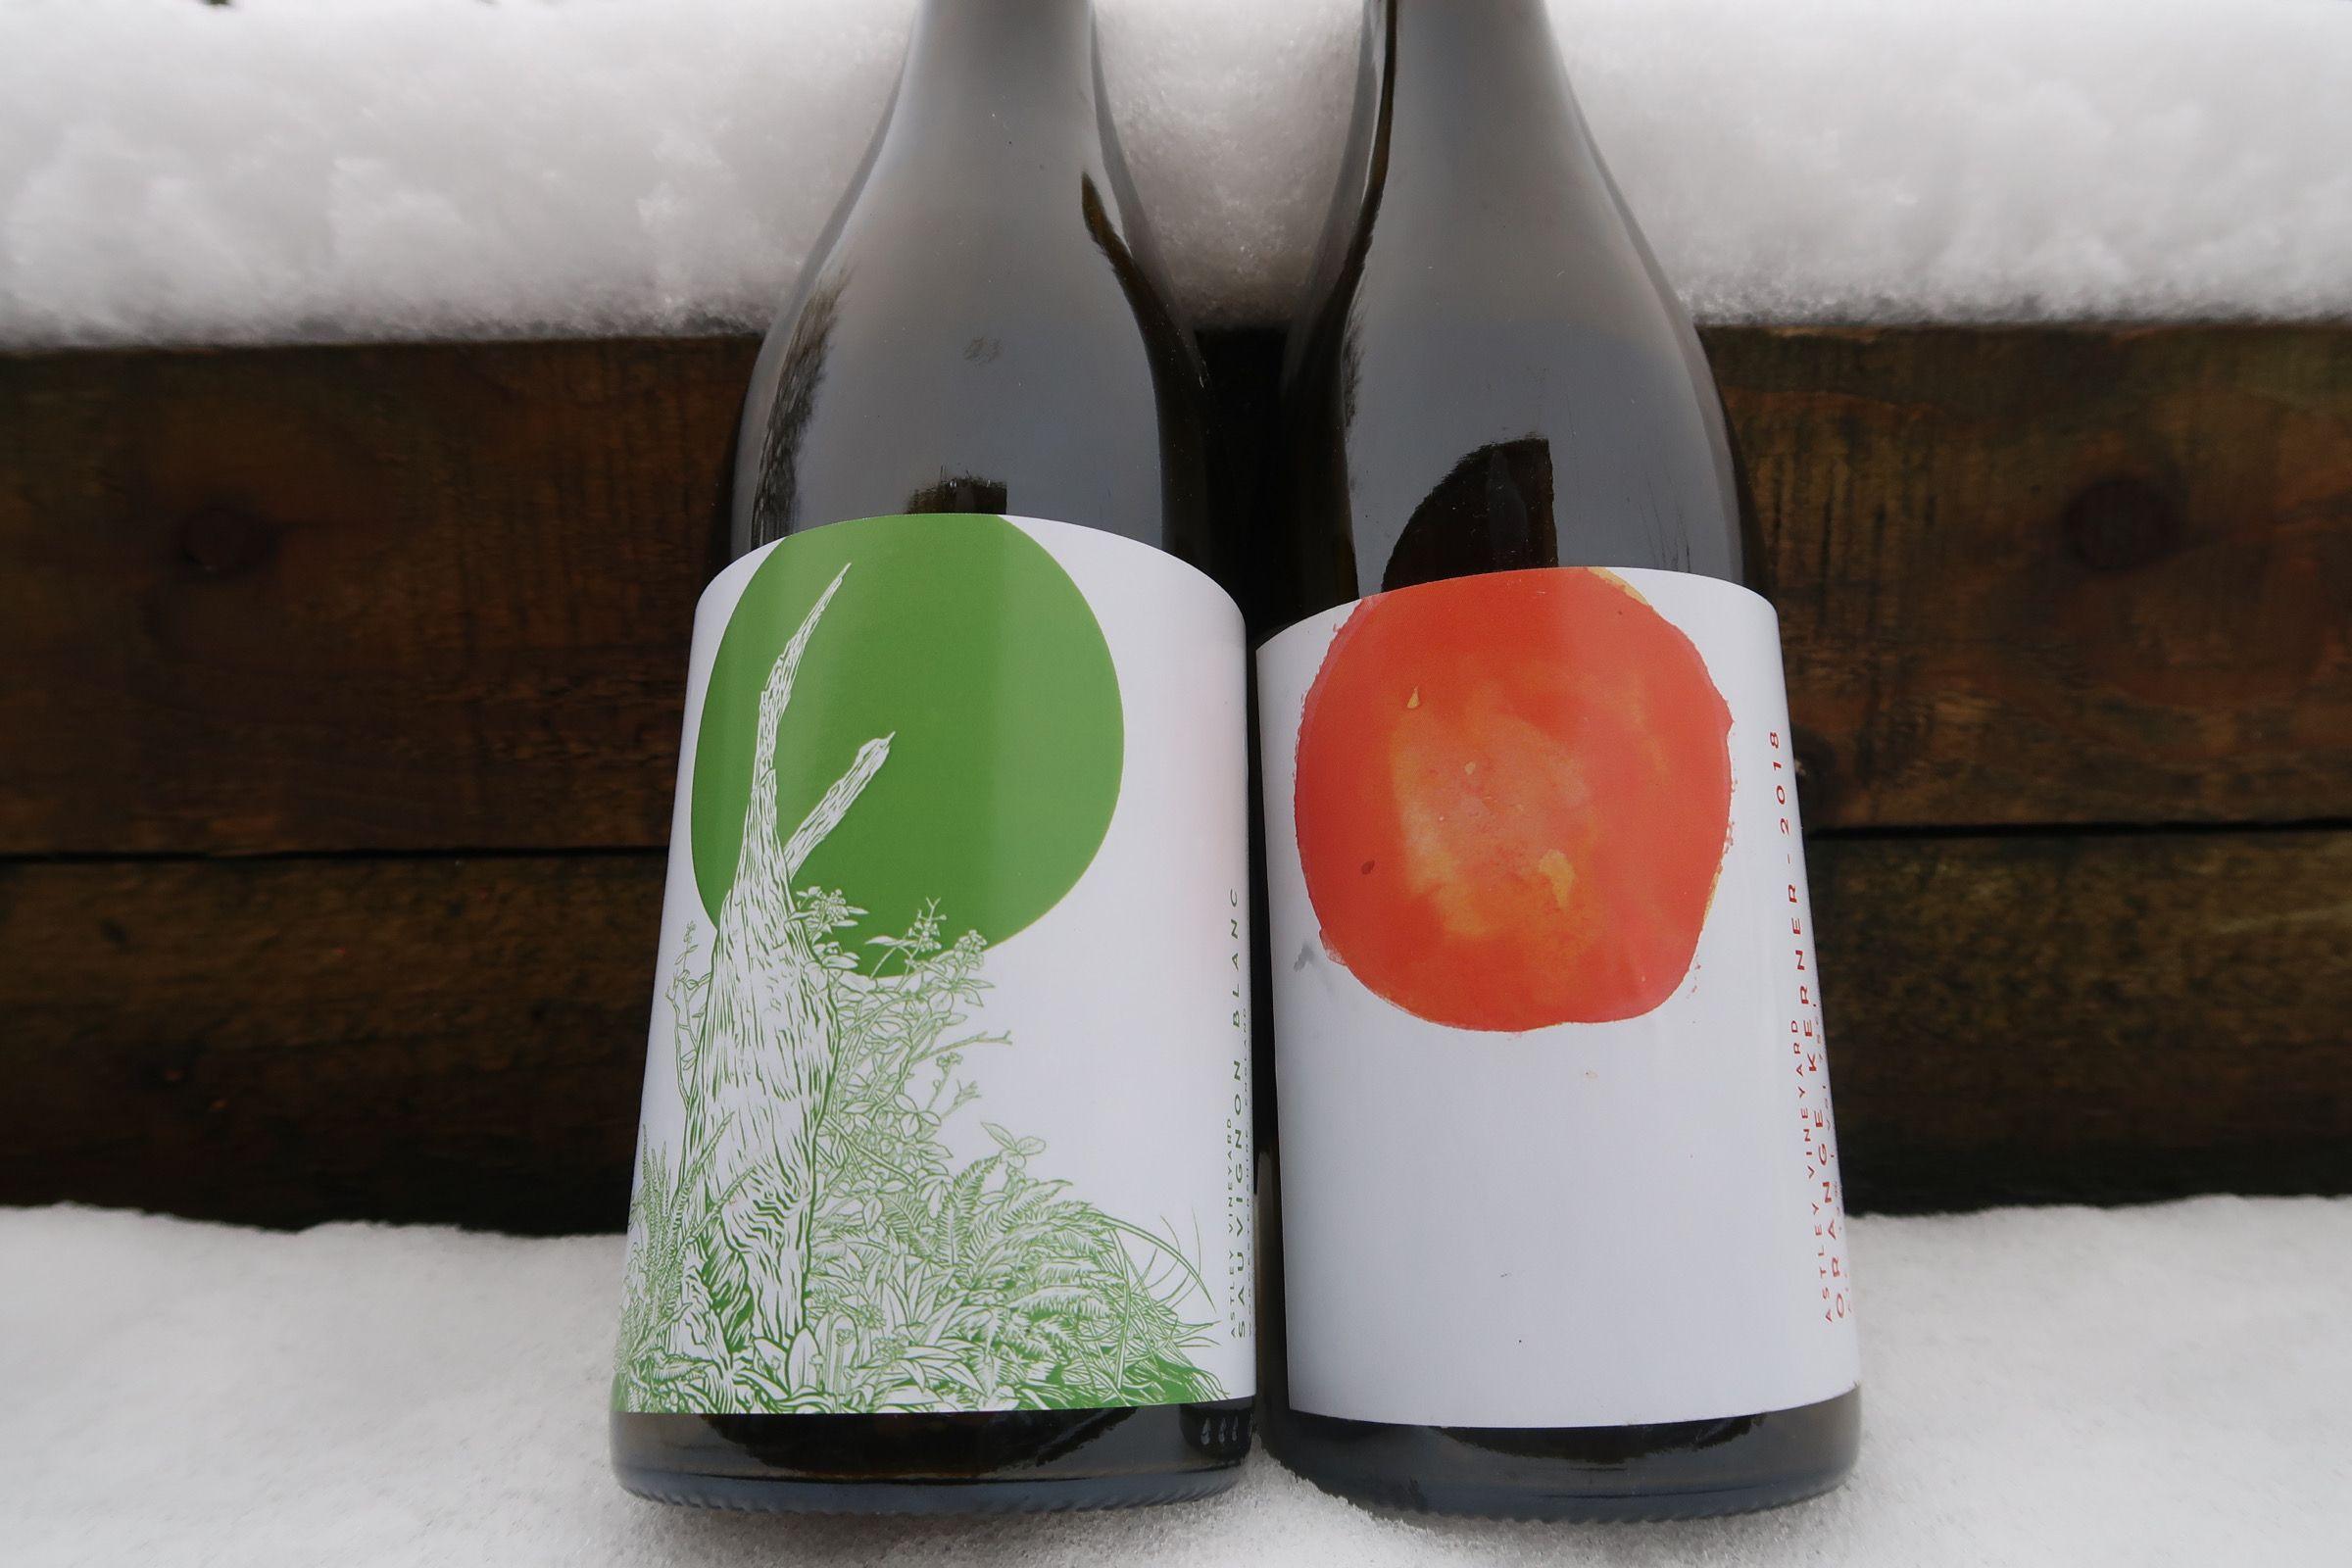 Astley Vineyard - Sauvignon & Orange wine